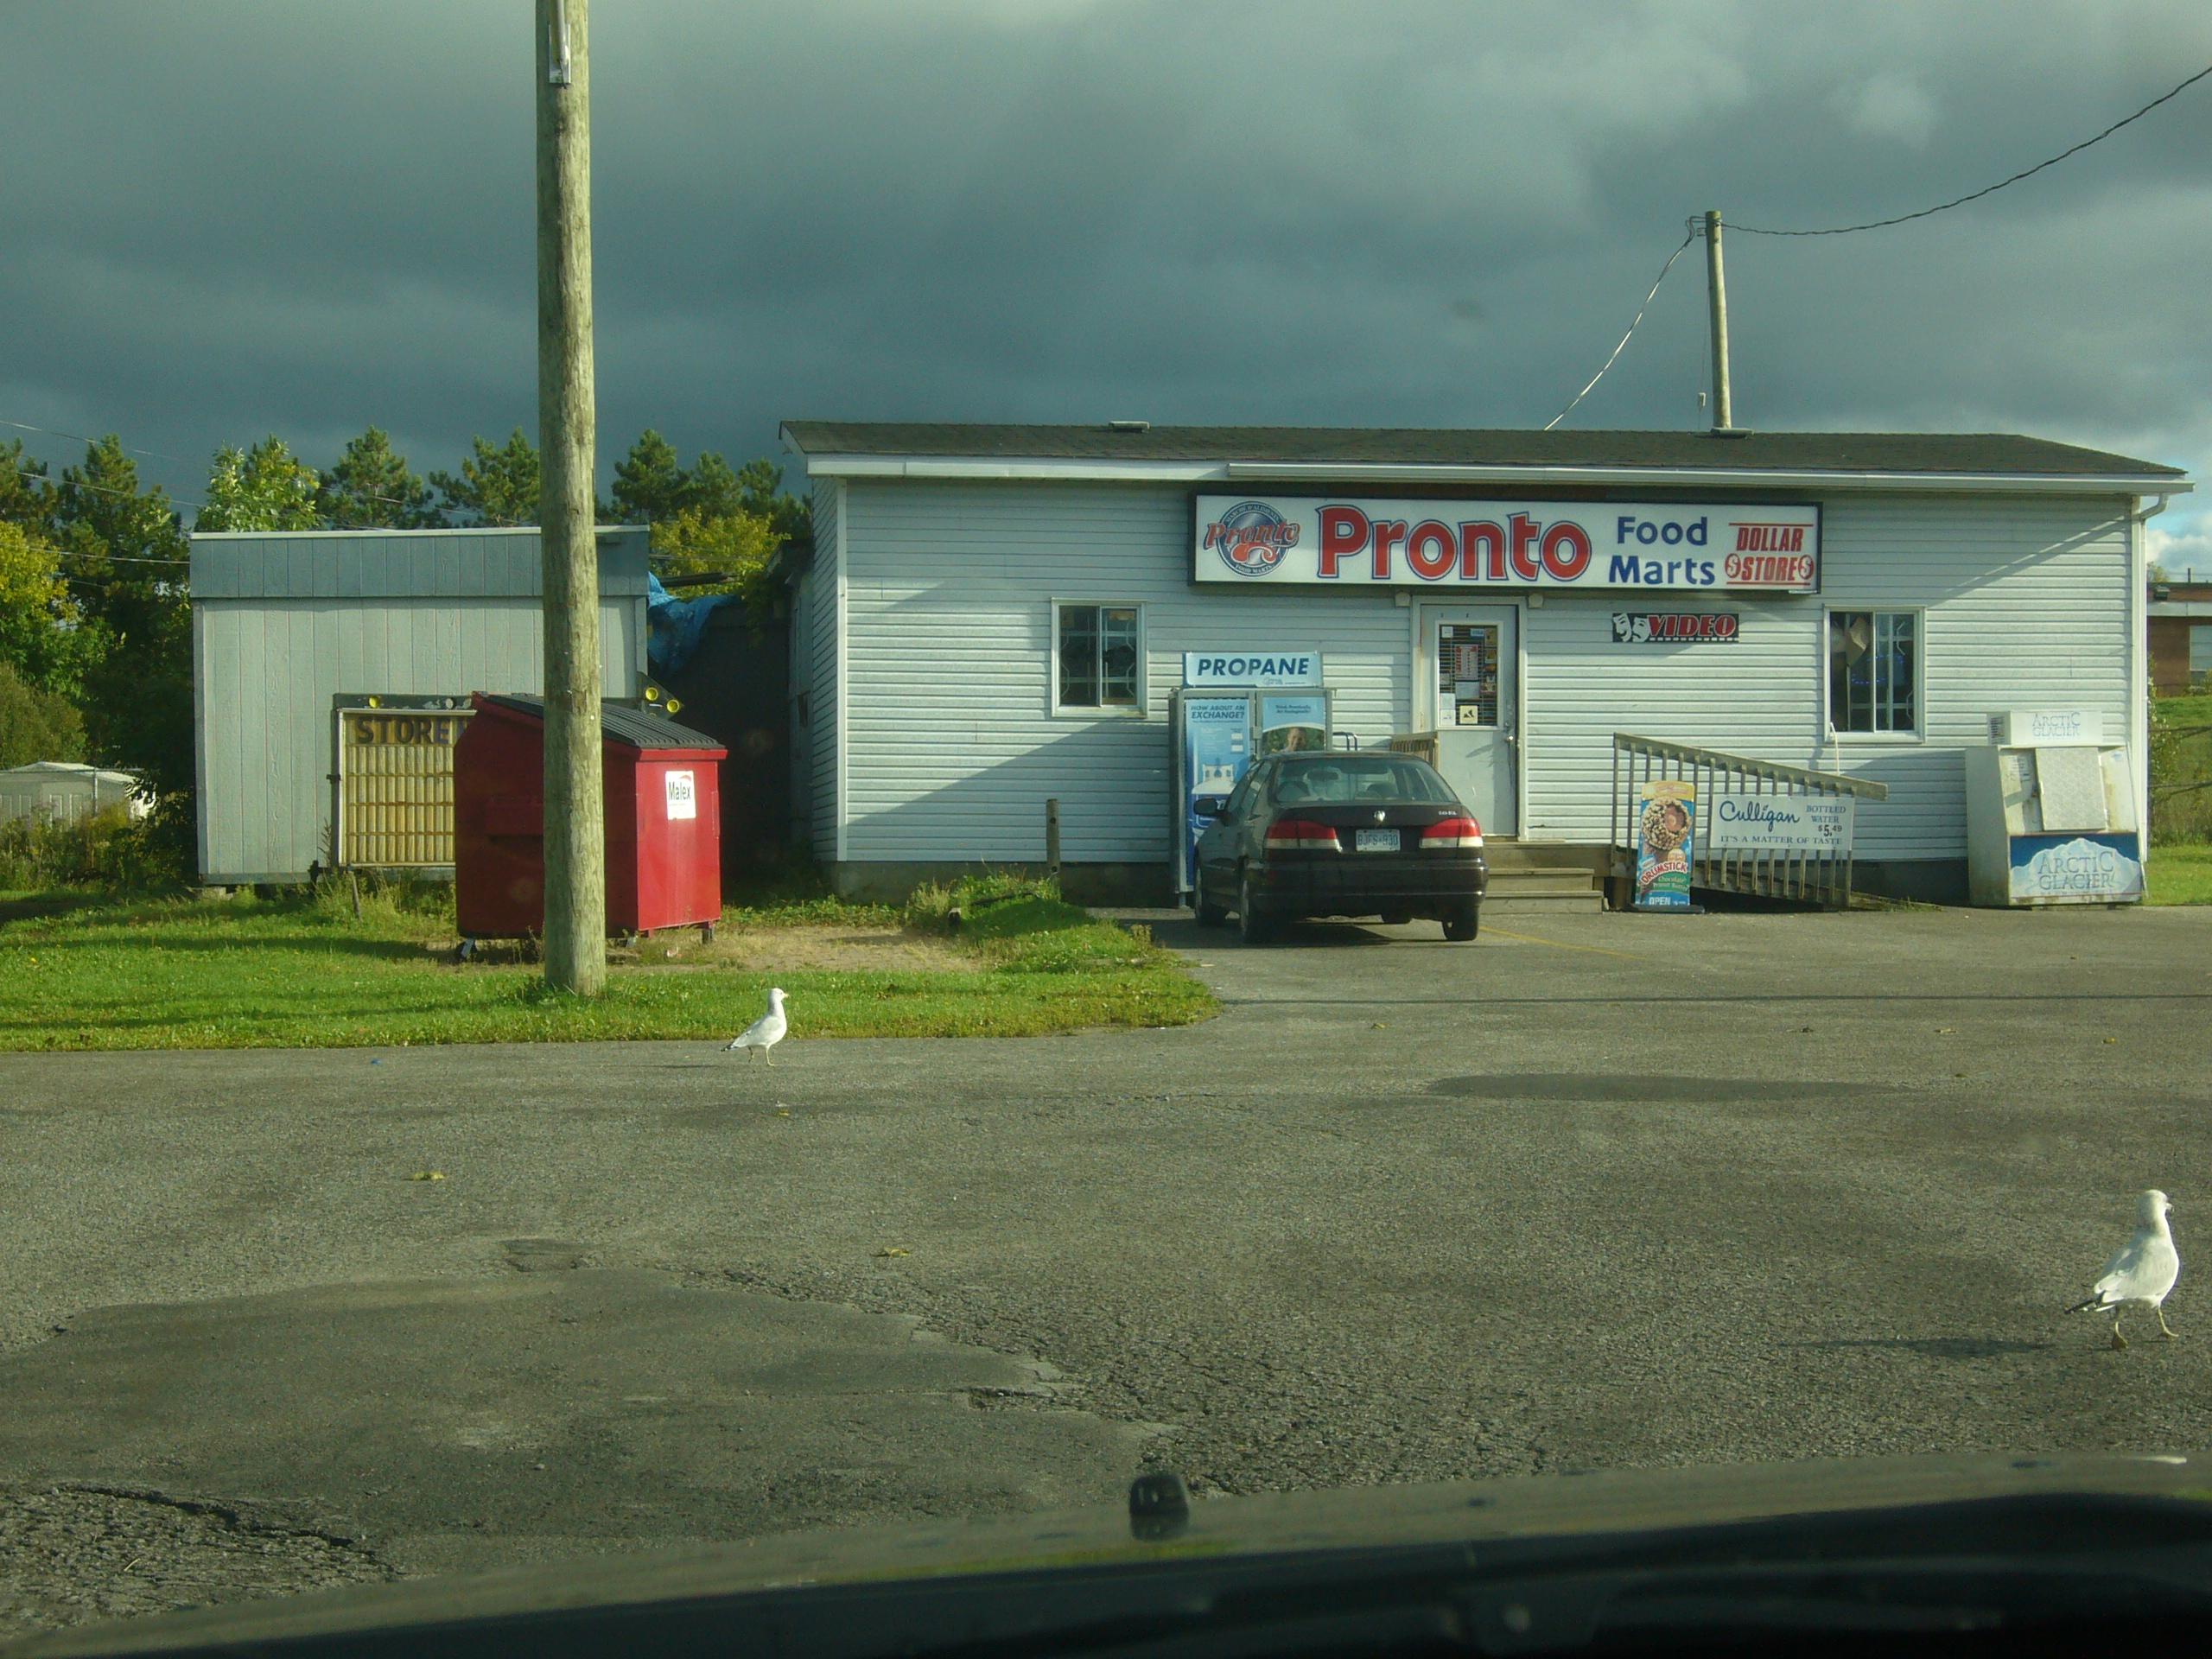 Pronto Food Mart Maxville Ontario